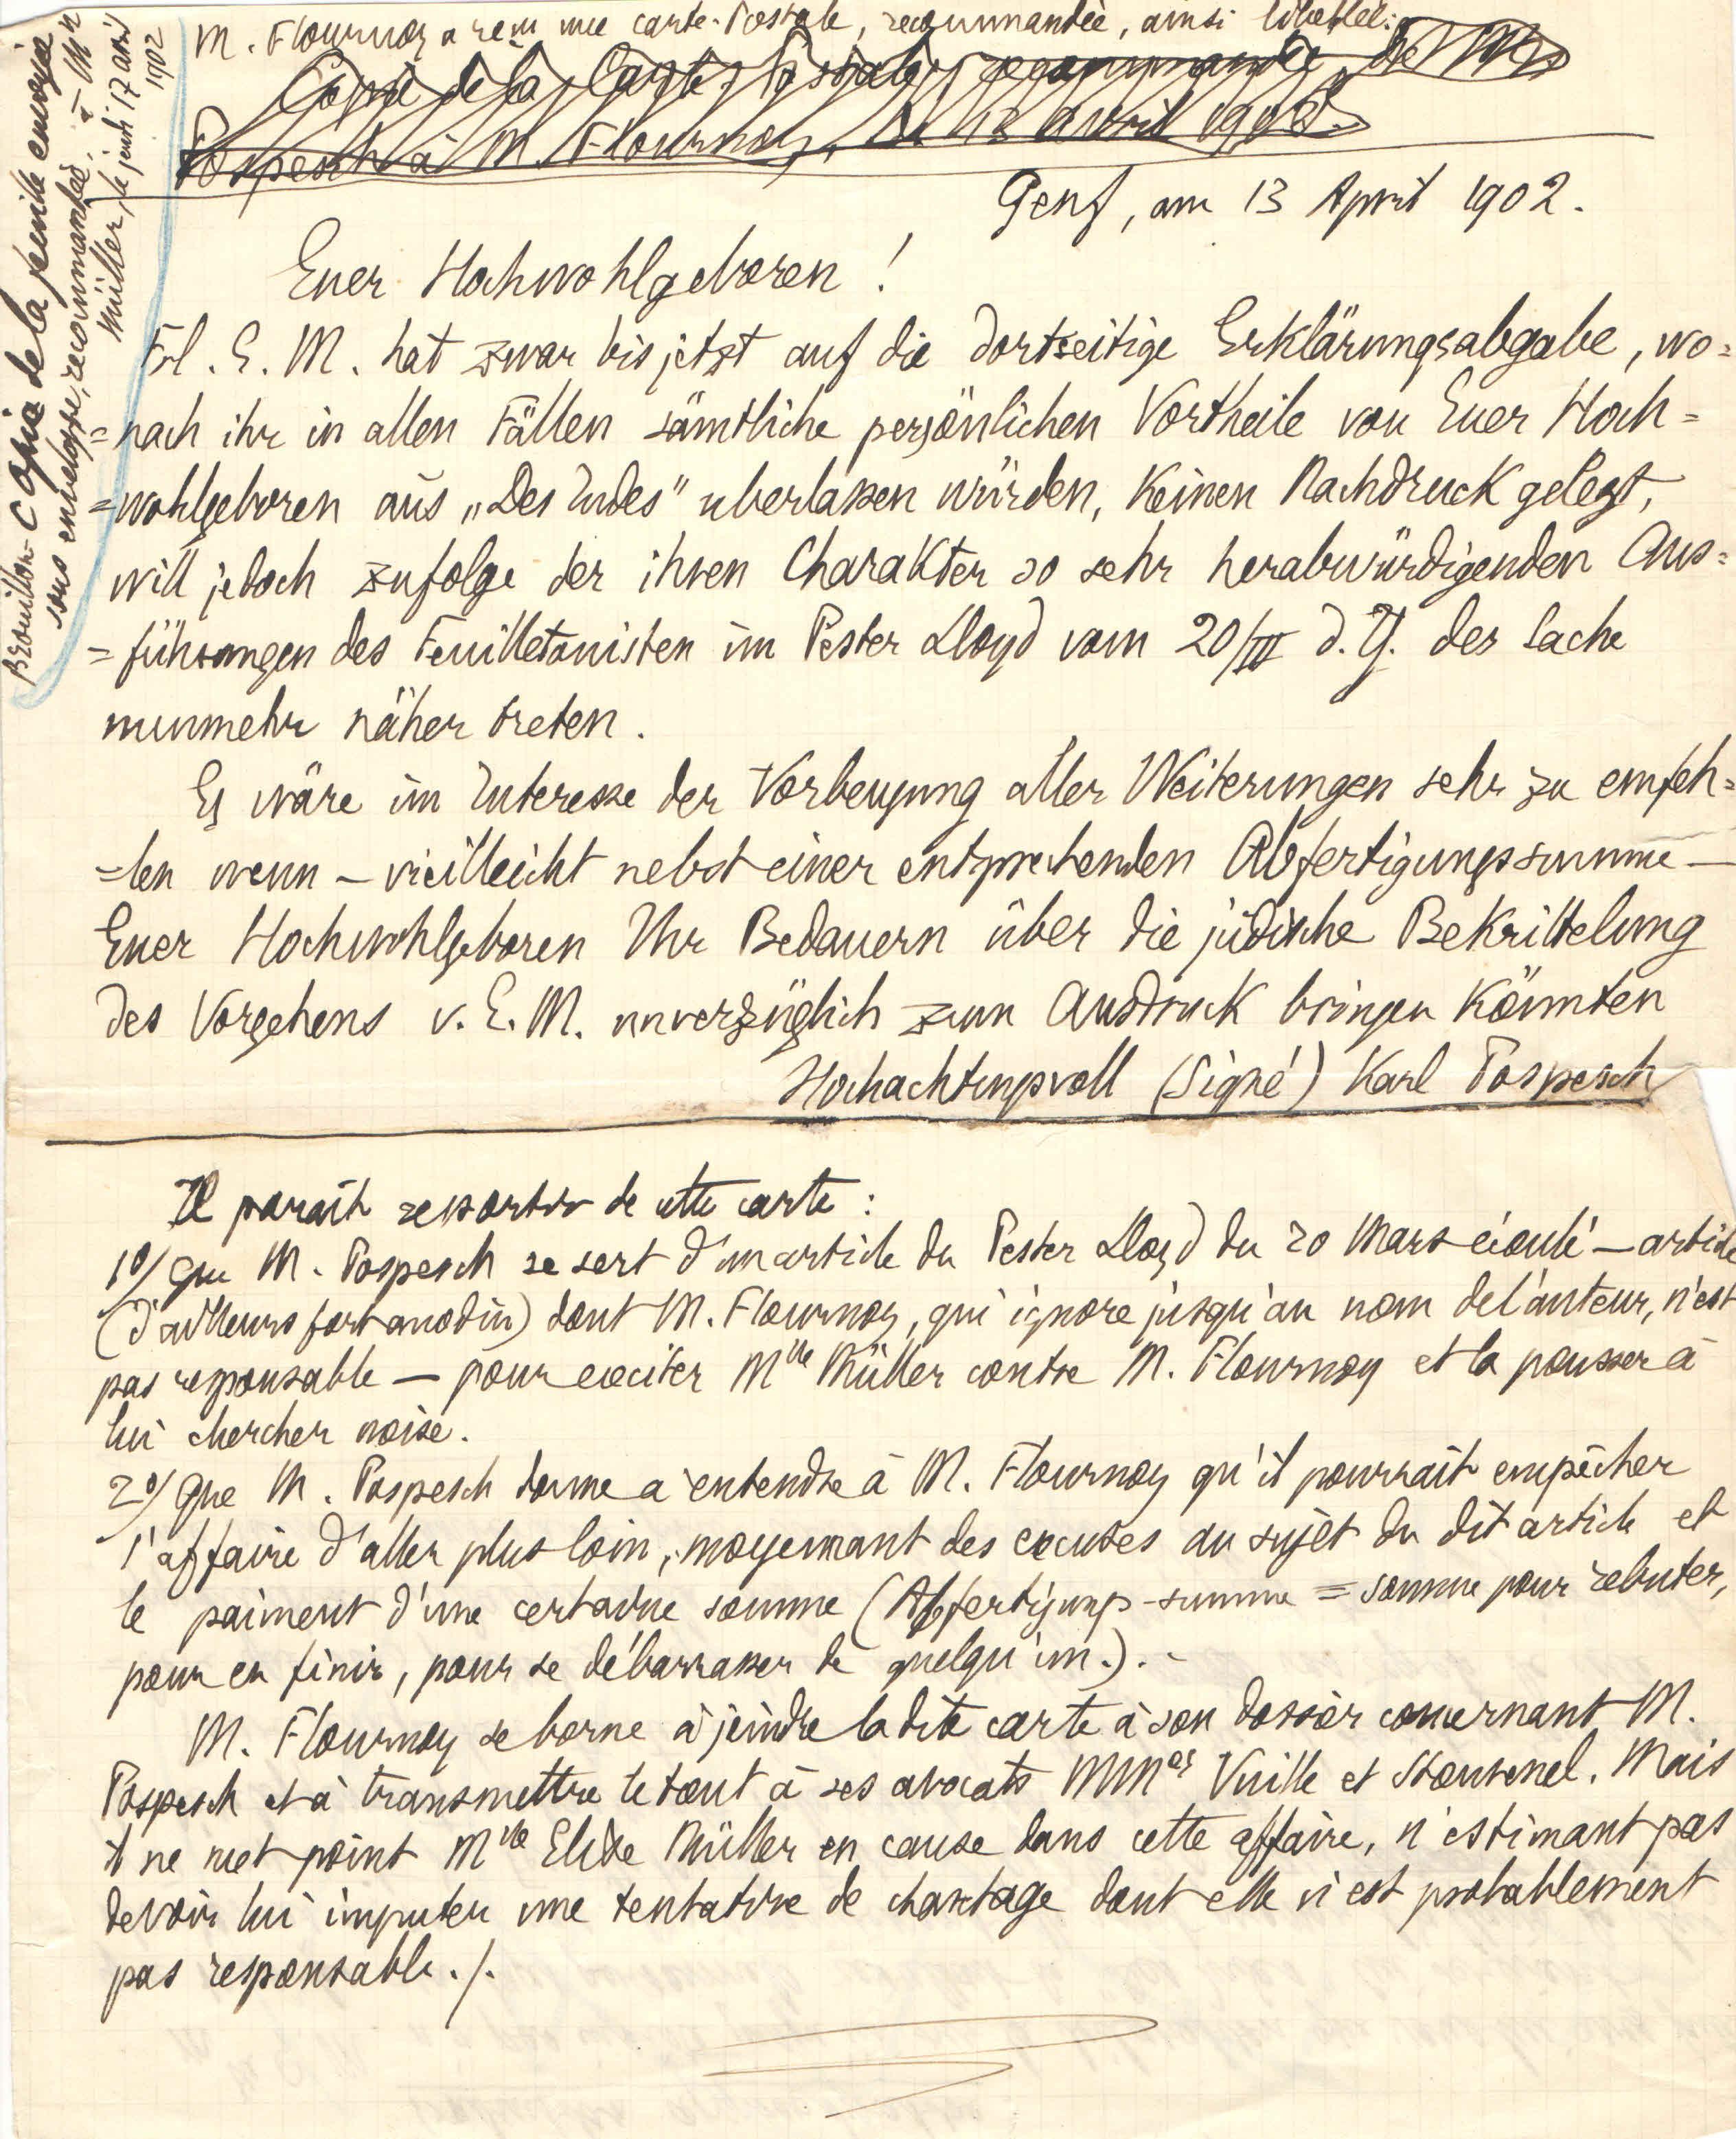 Lettre de Karl Propesch